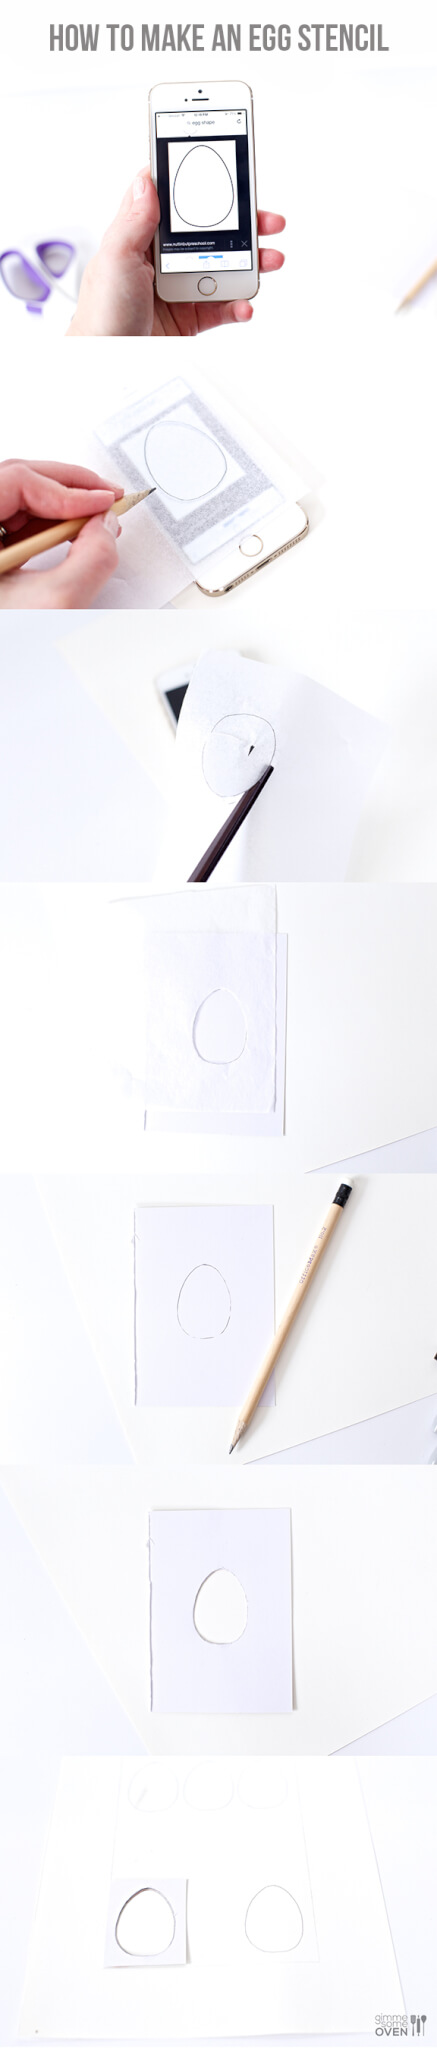 How To Make An Egg Stencil | gimmesomeoven.com